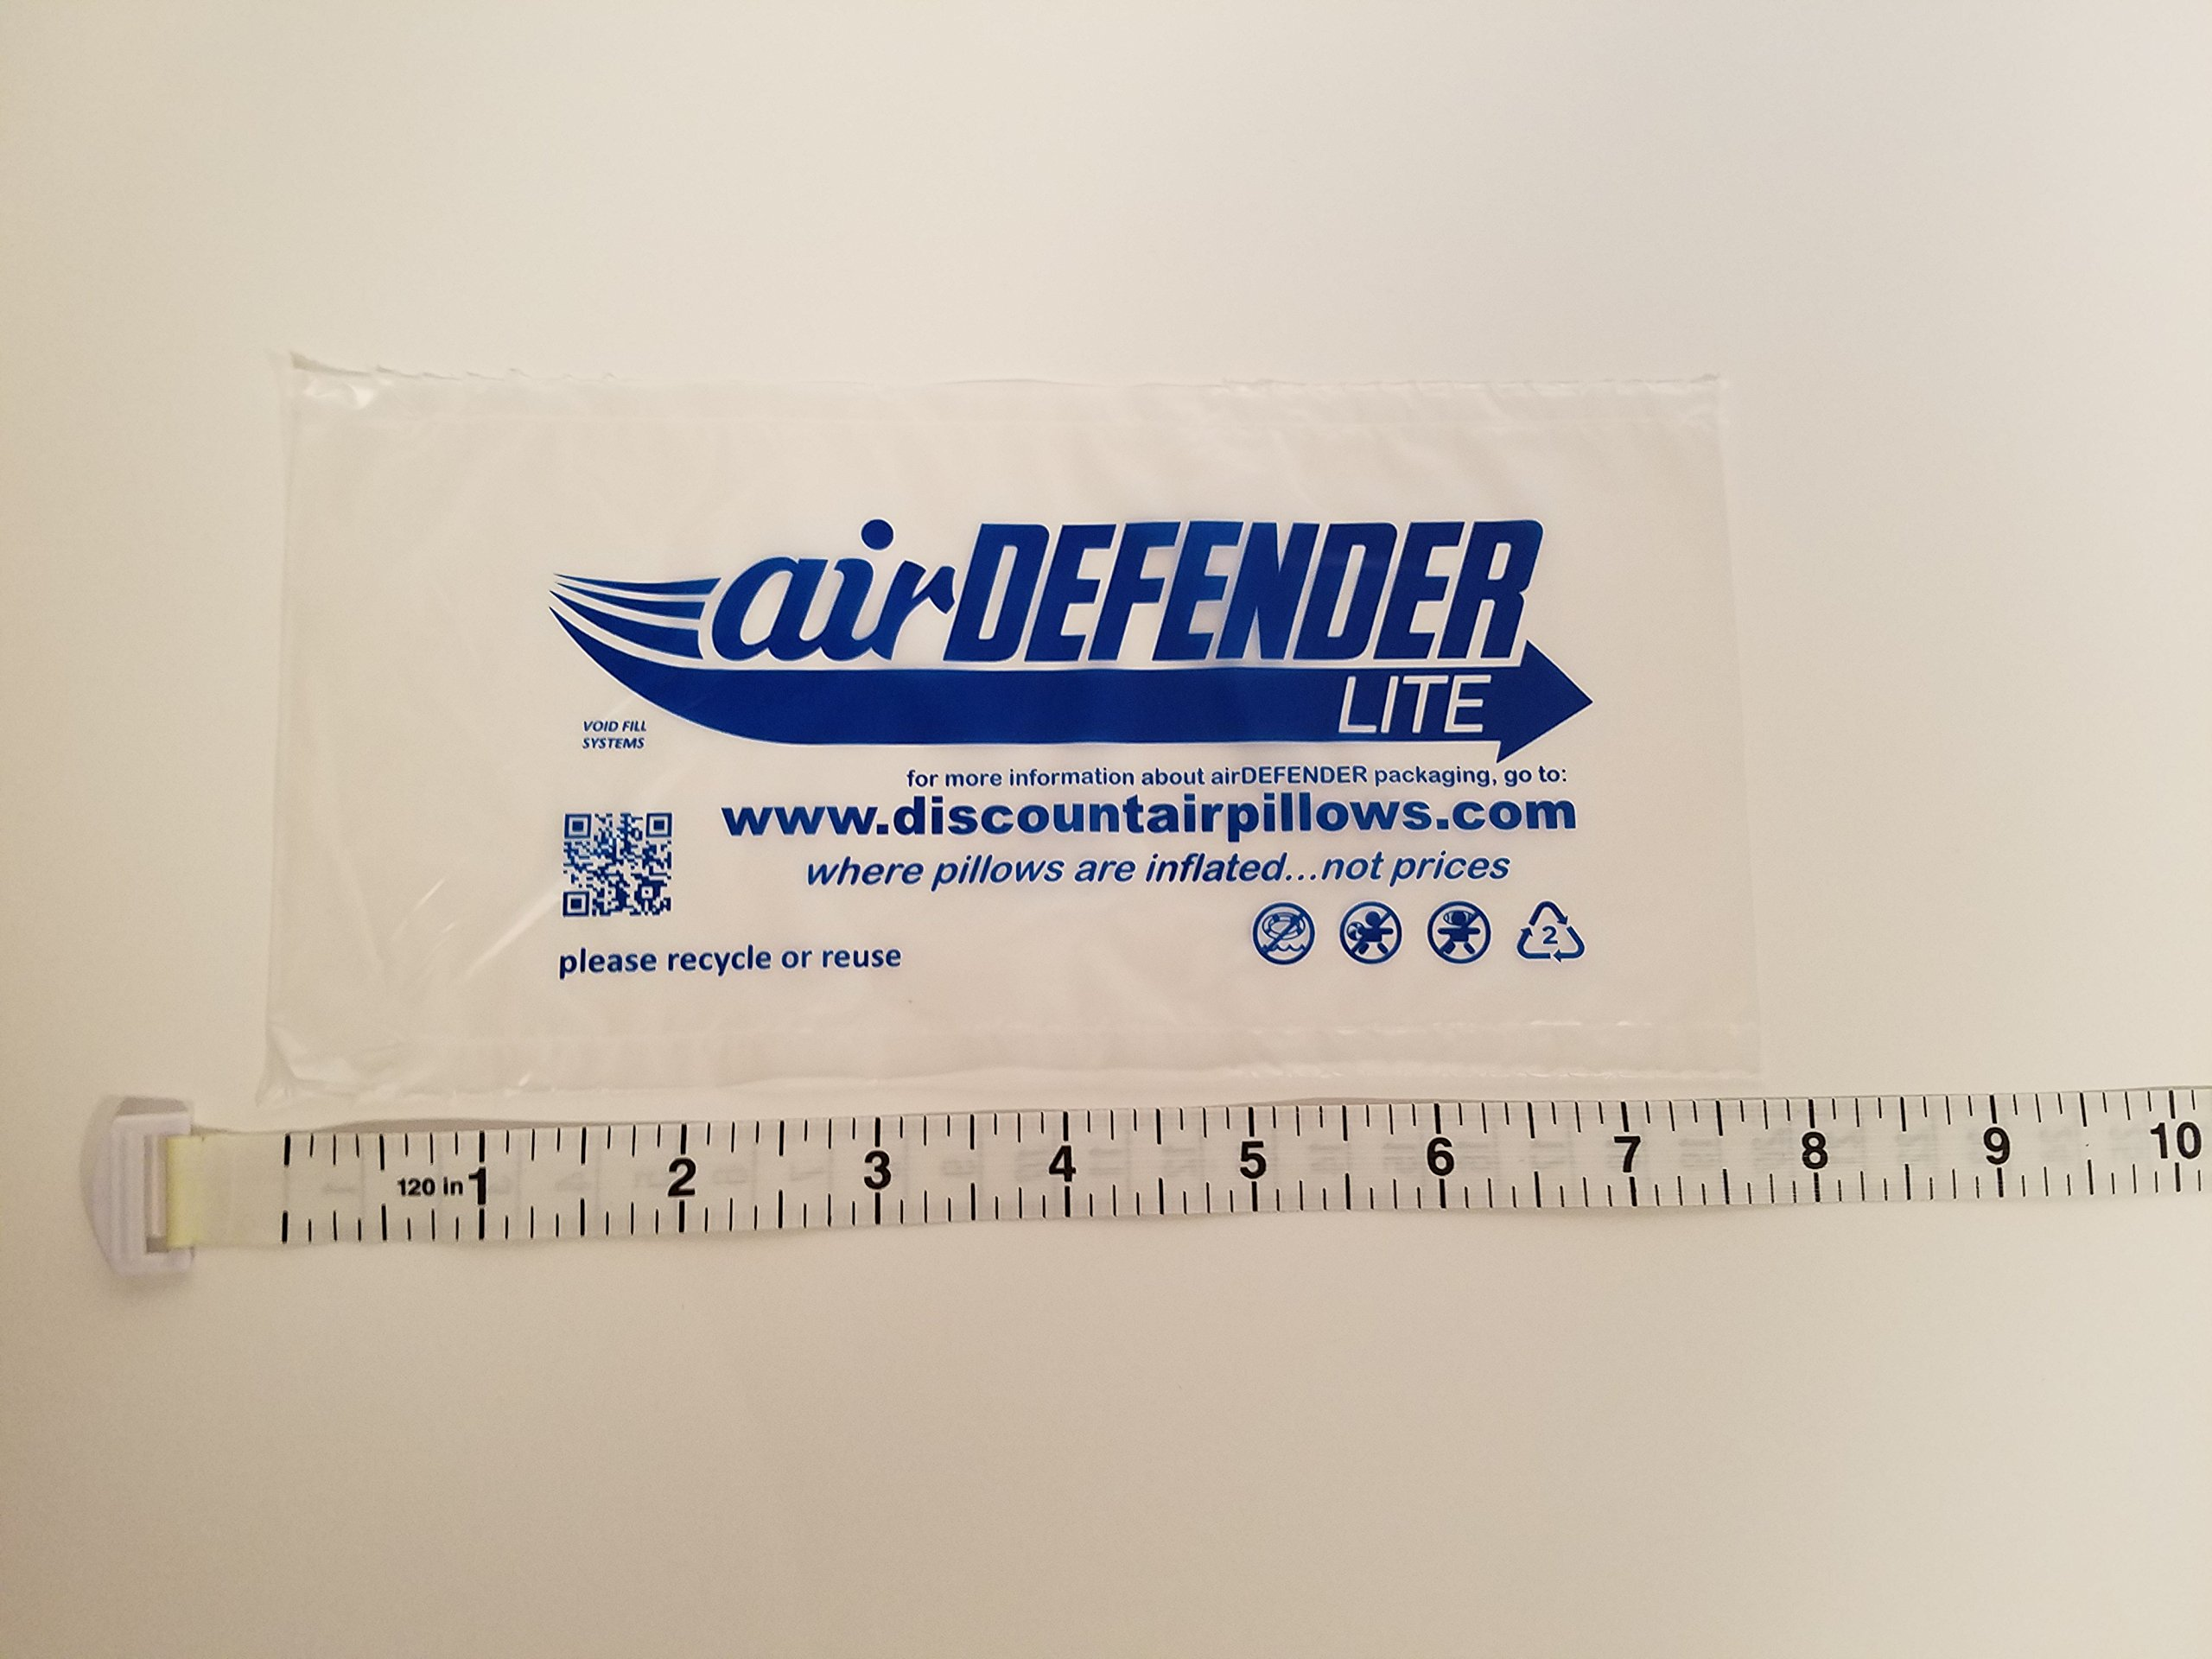 4 x 8 airDEFENDER air pillows 990 quantity 120 gallons 16 cubic feet void fill cushioning from Discount Air Pillows by Discount Air Pillows, LLC (Image #6)